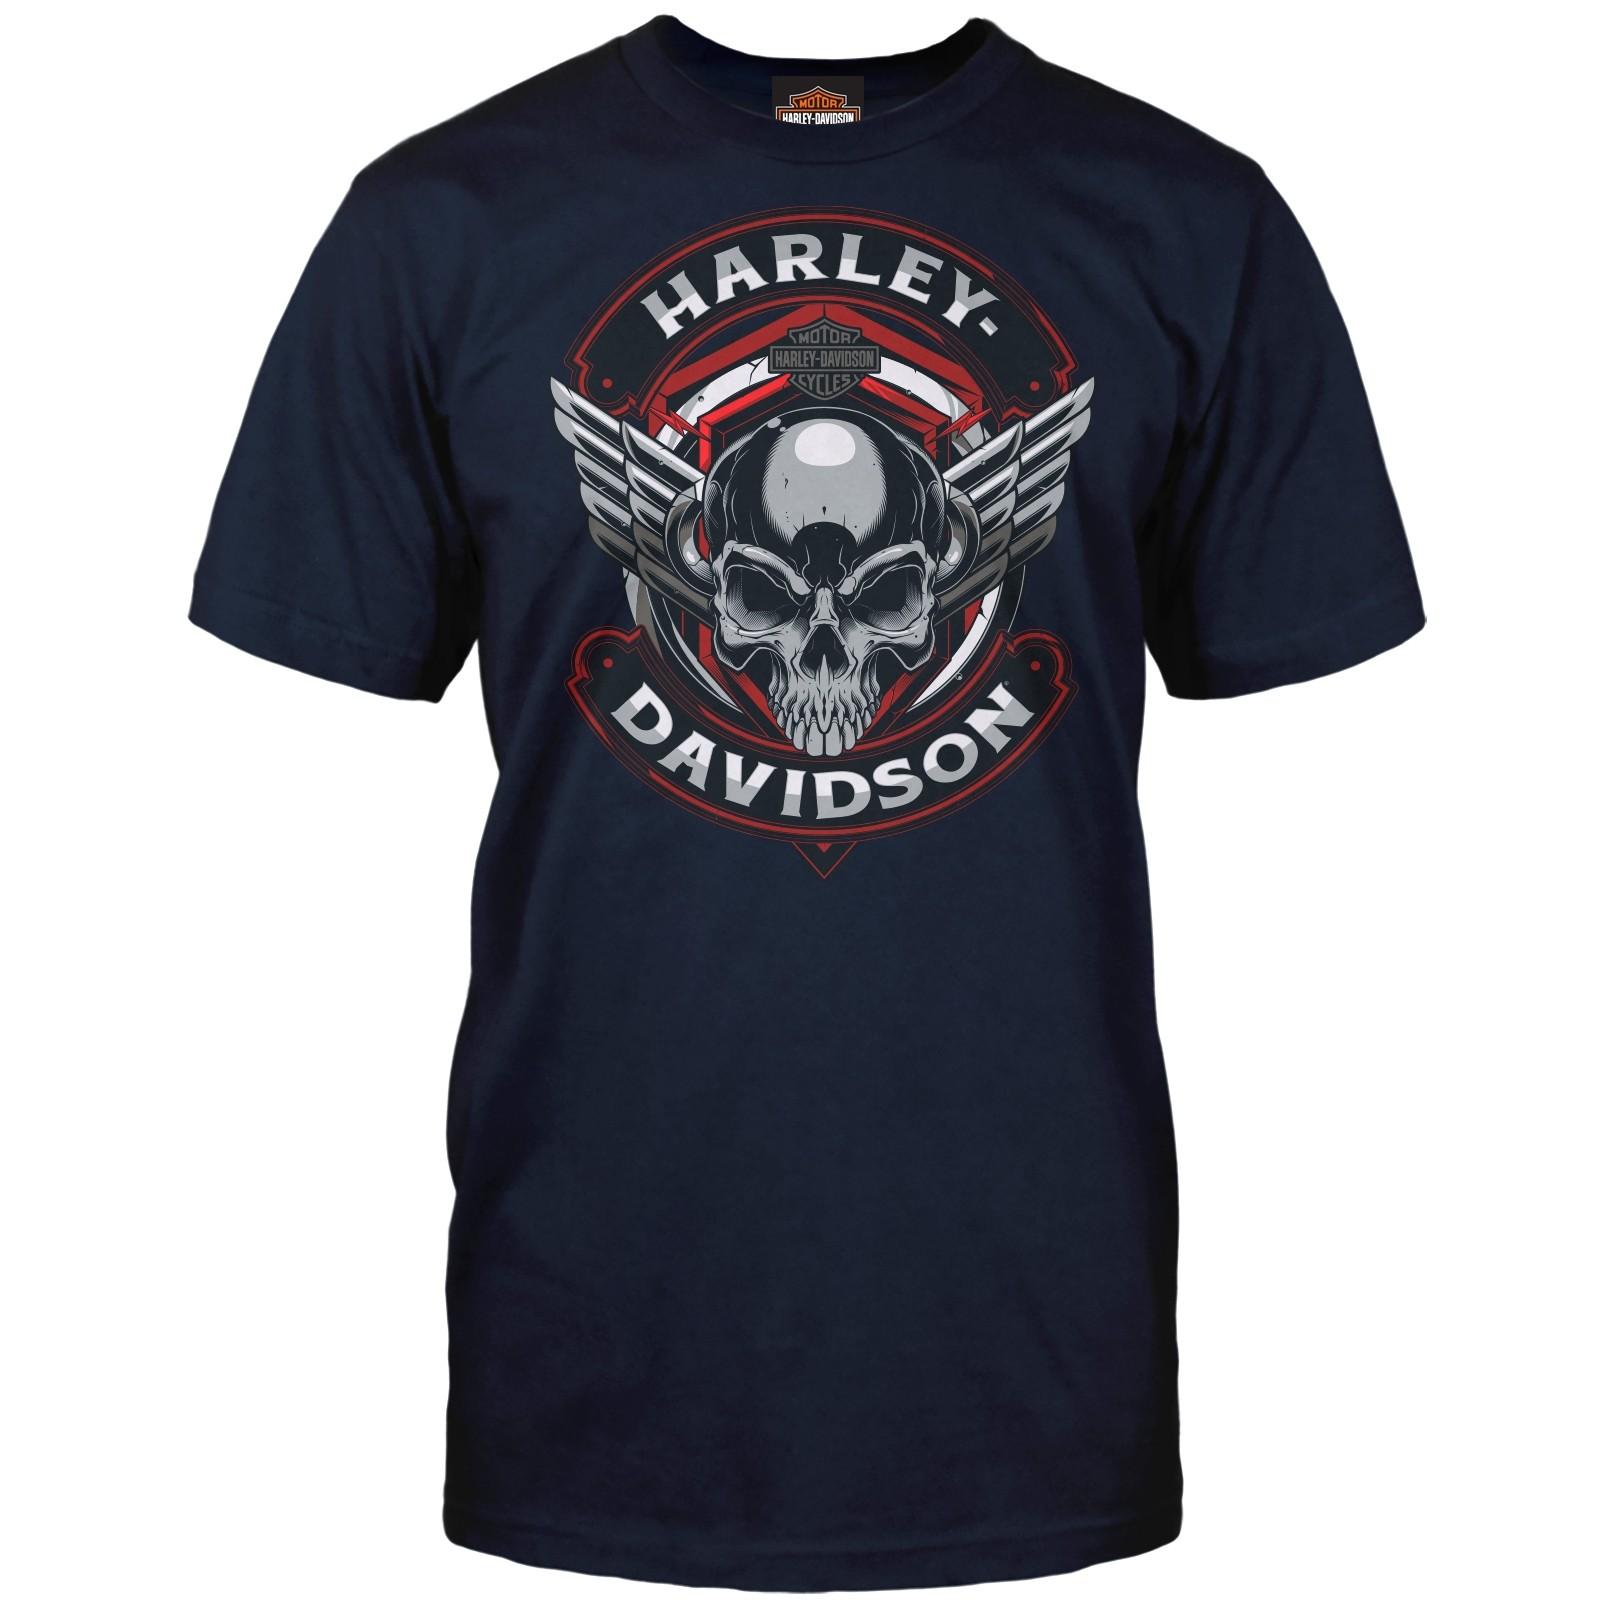 Harley-Davidson Men's Graphic Tee - Camp Humphreys | Steel Winged